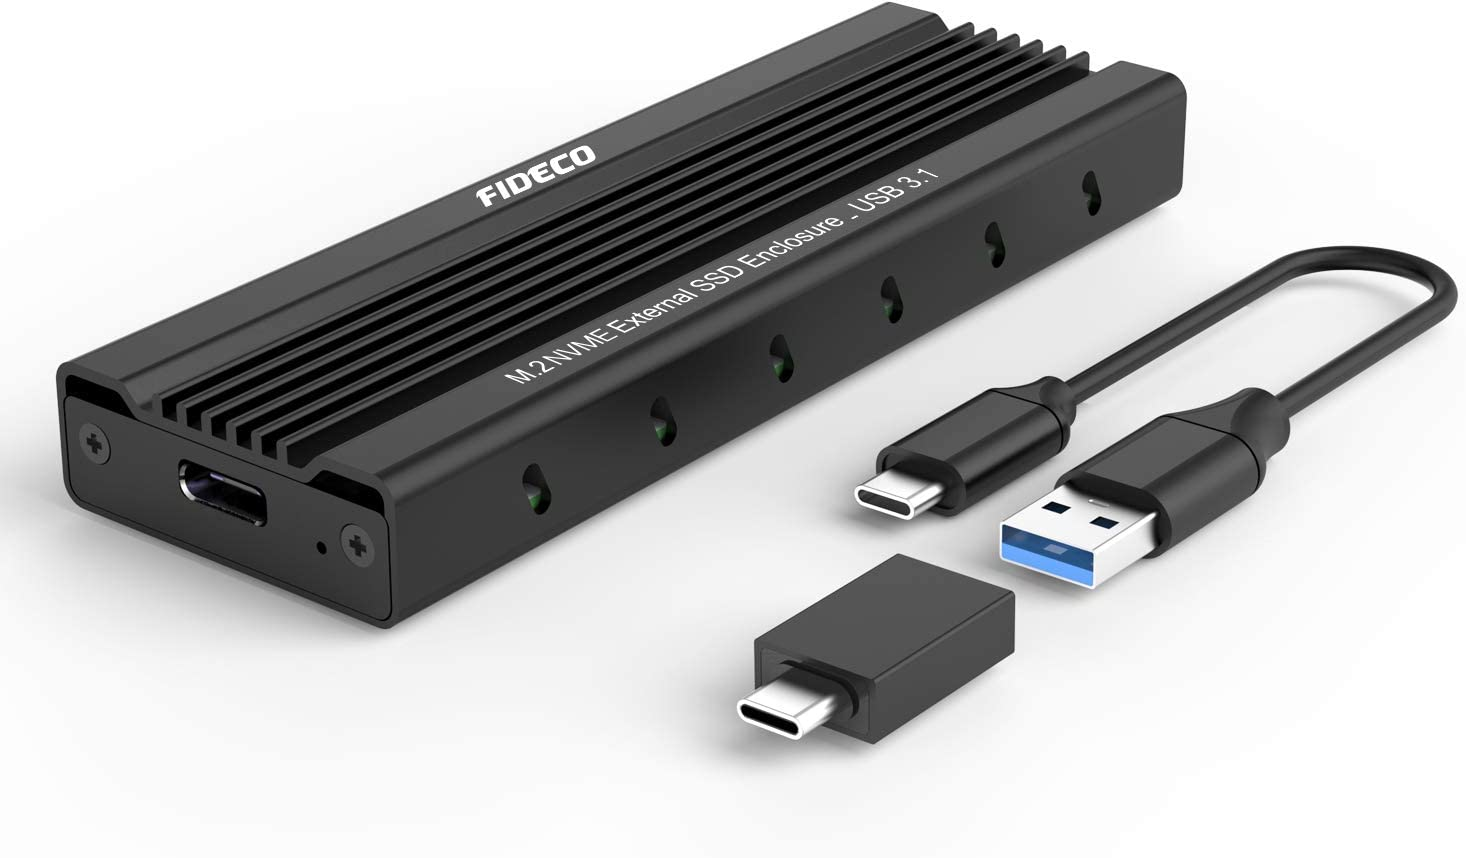 FIDECO M.2 NVME Carcaça Externa SSD, PCIe USB 3.1 Gen 2, 10 Gbps ...